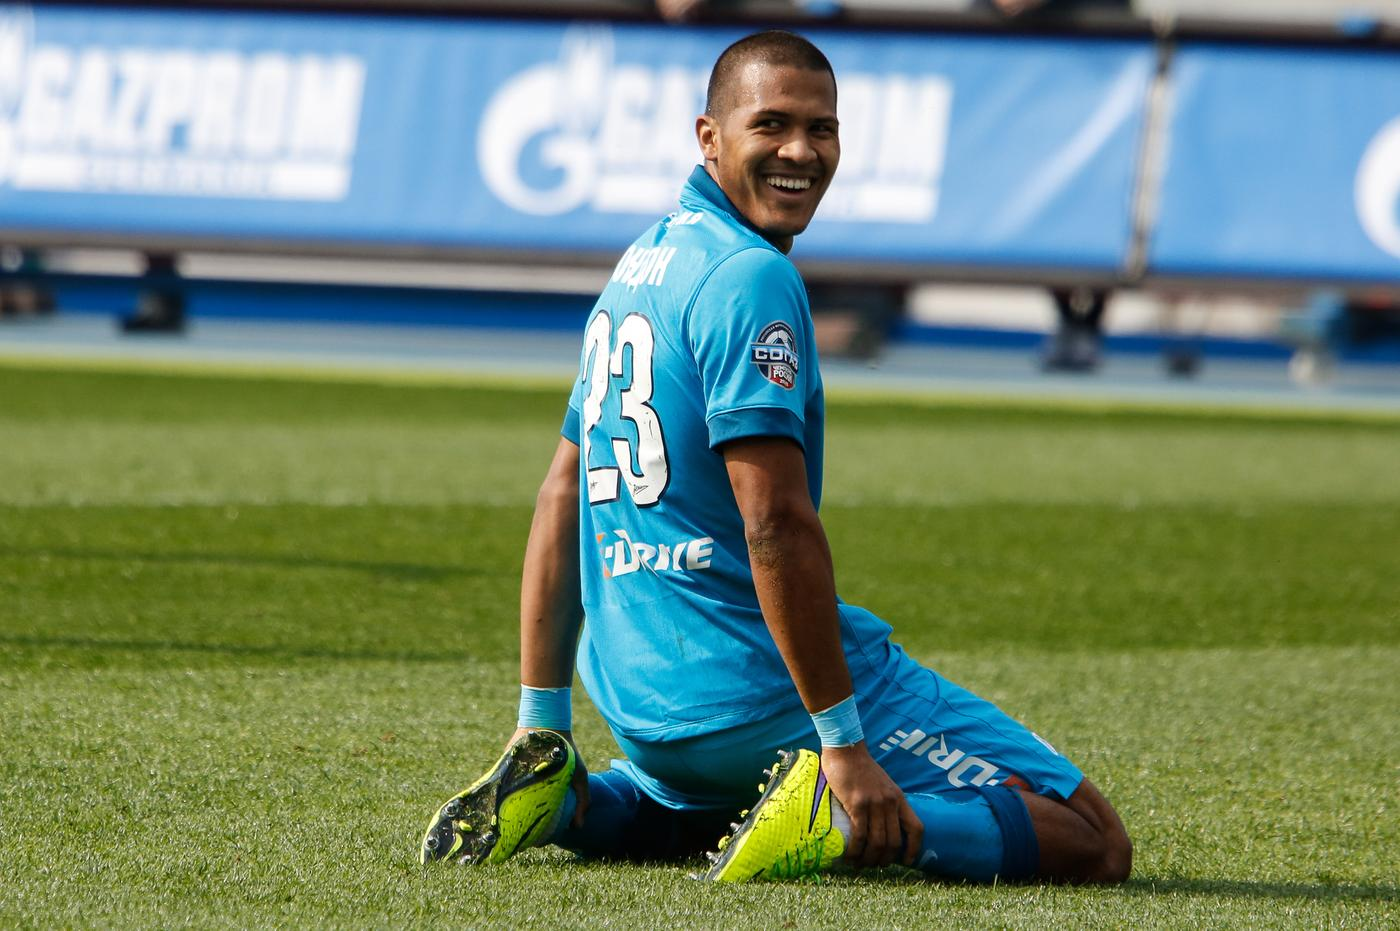 West Brom 'set to complete club-record transfer of Salomon Rondon after Zenit St Petersburg striker arrives for medical'